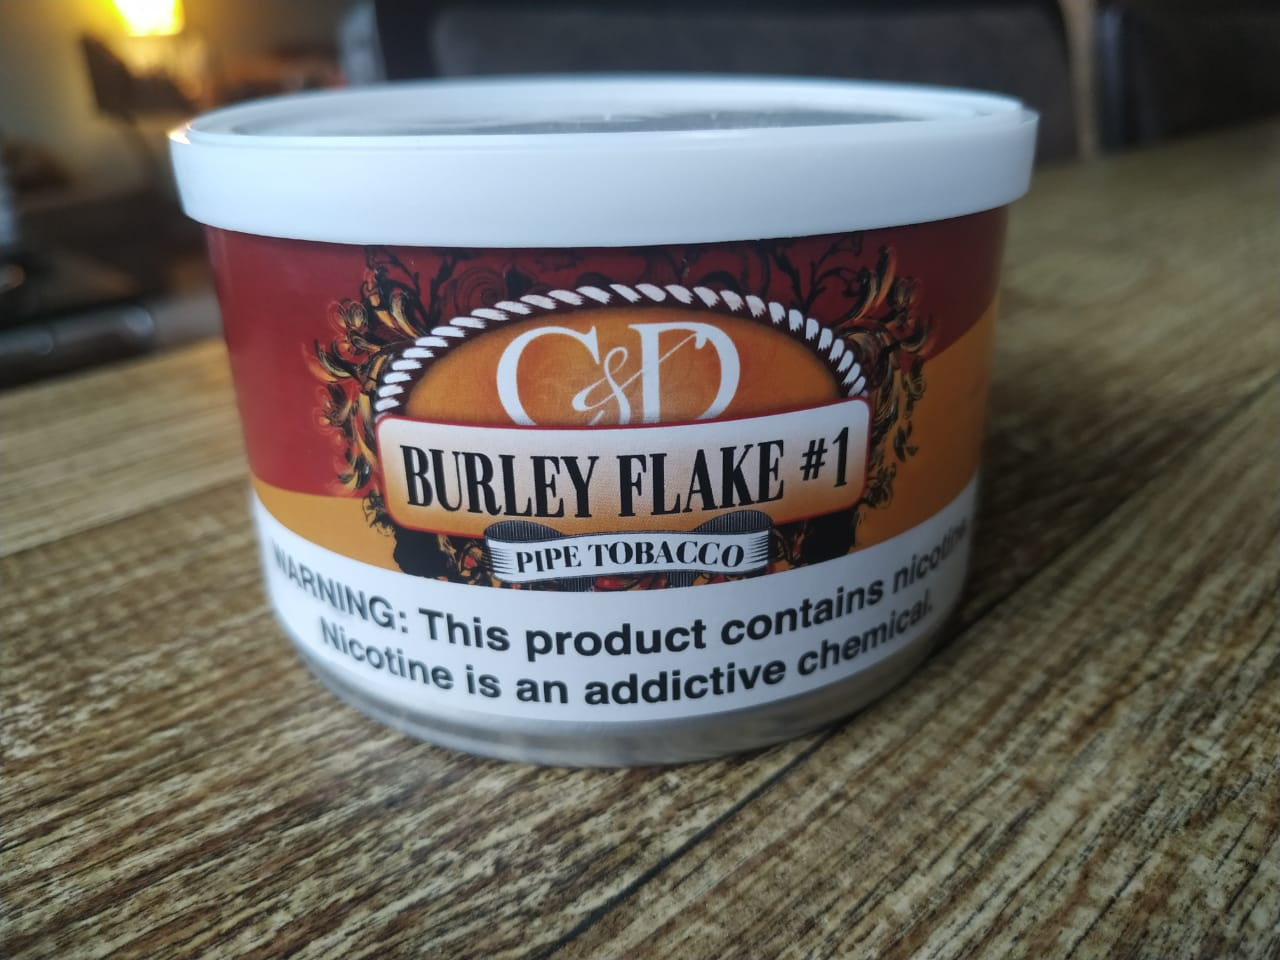 Cornell & Diehl - Burley Flake #1